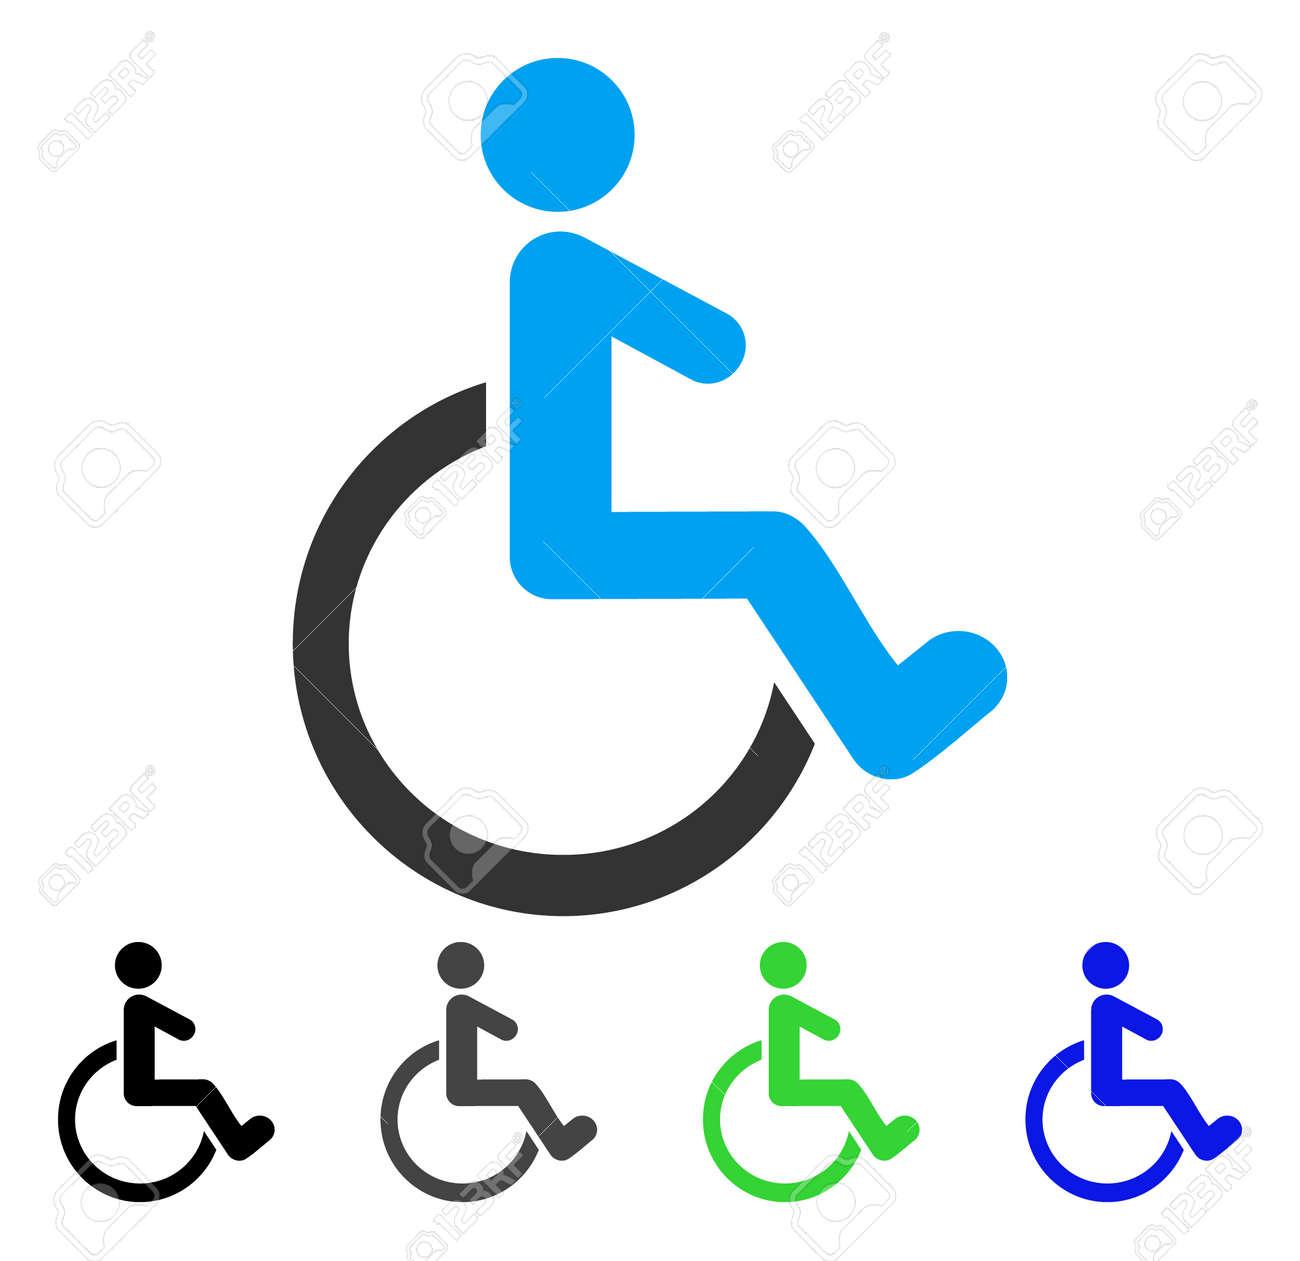 Rollstuhl Wohnung Vektor Illustration. Farbiger Rollstuhl Grau, Schwarz,  Blau, Grüne